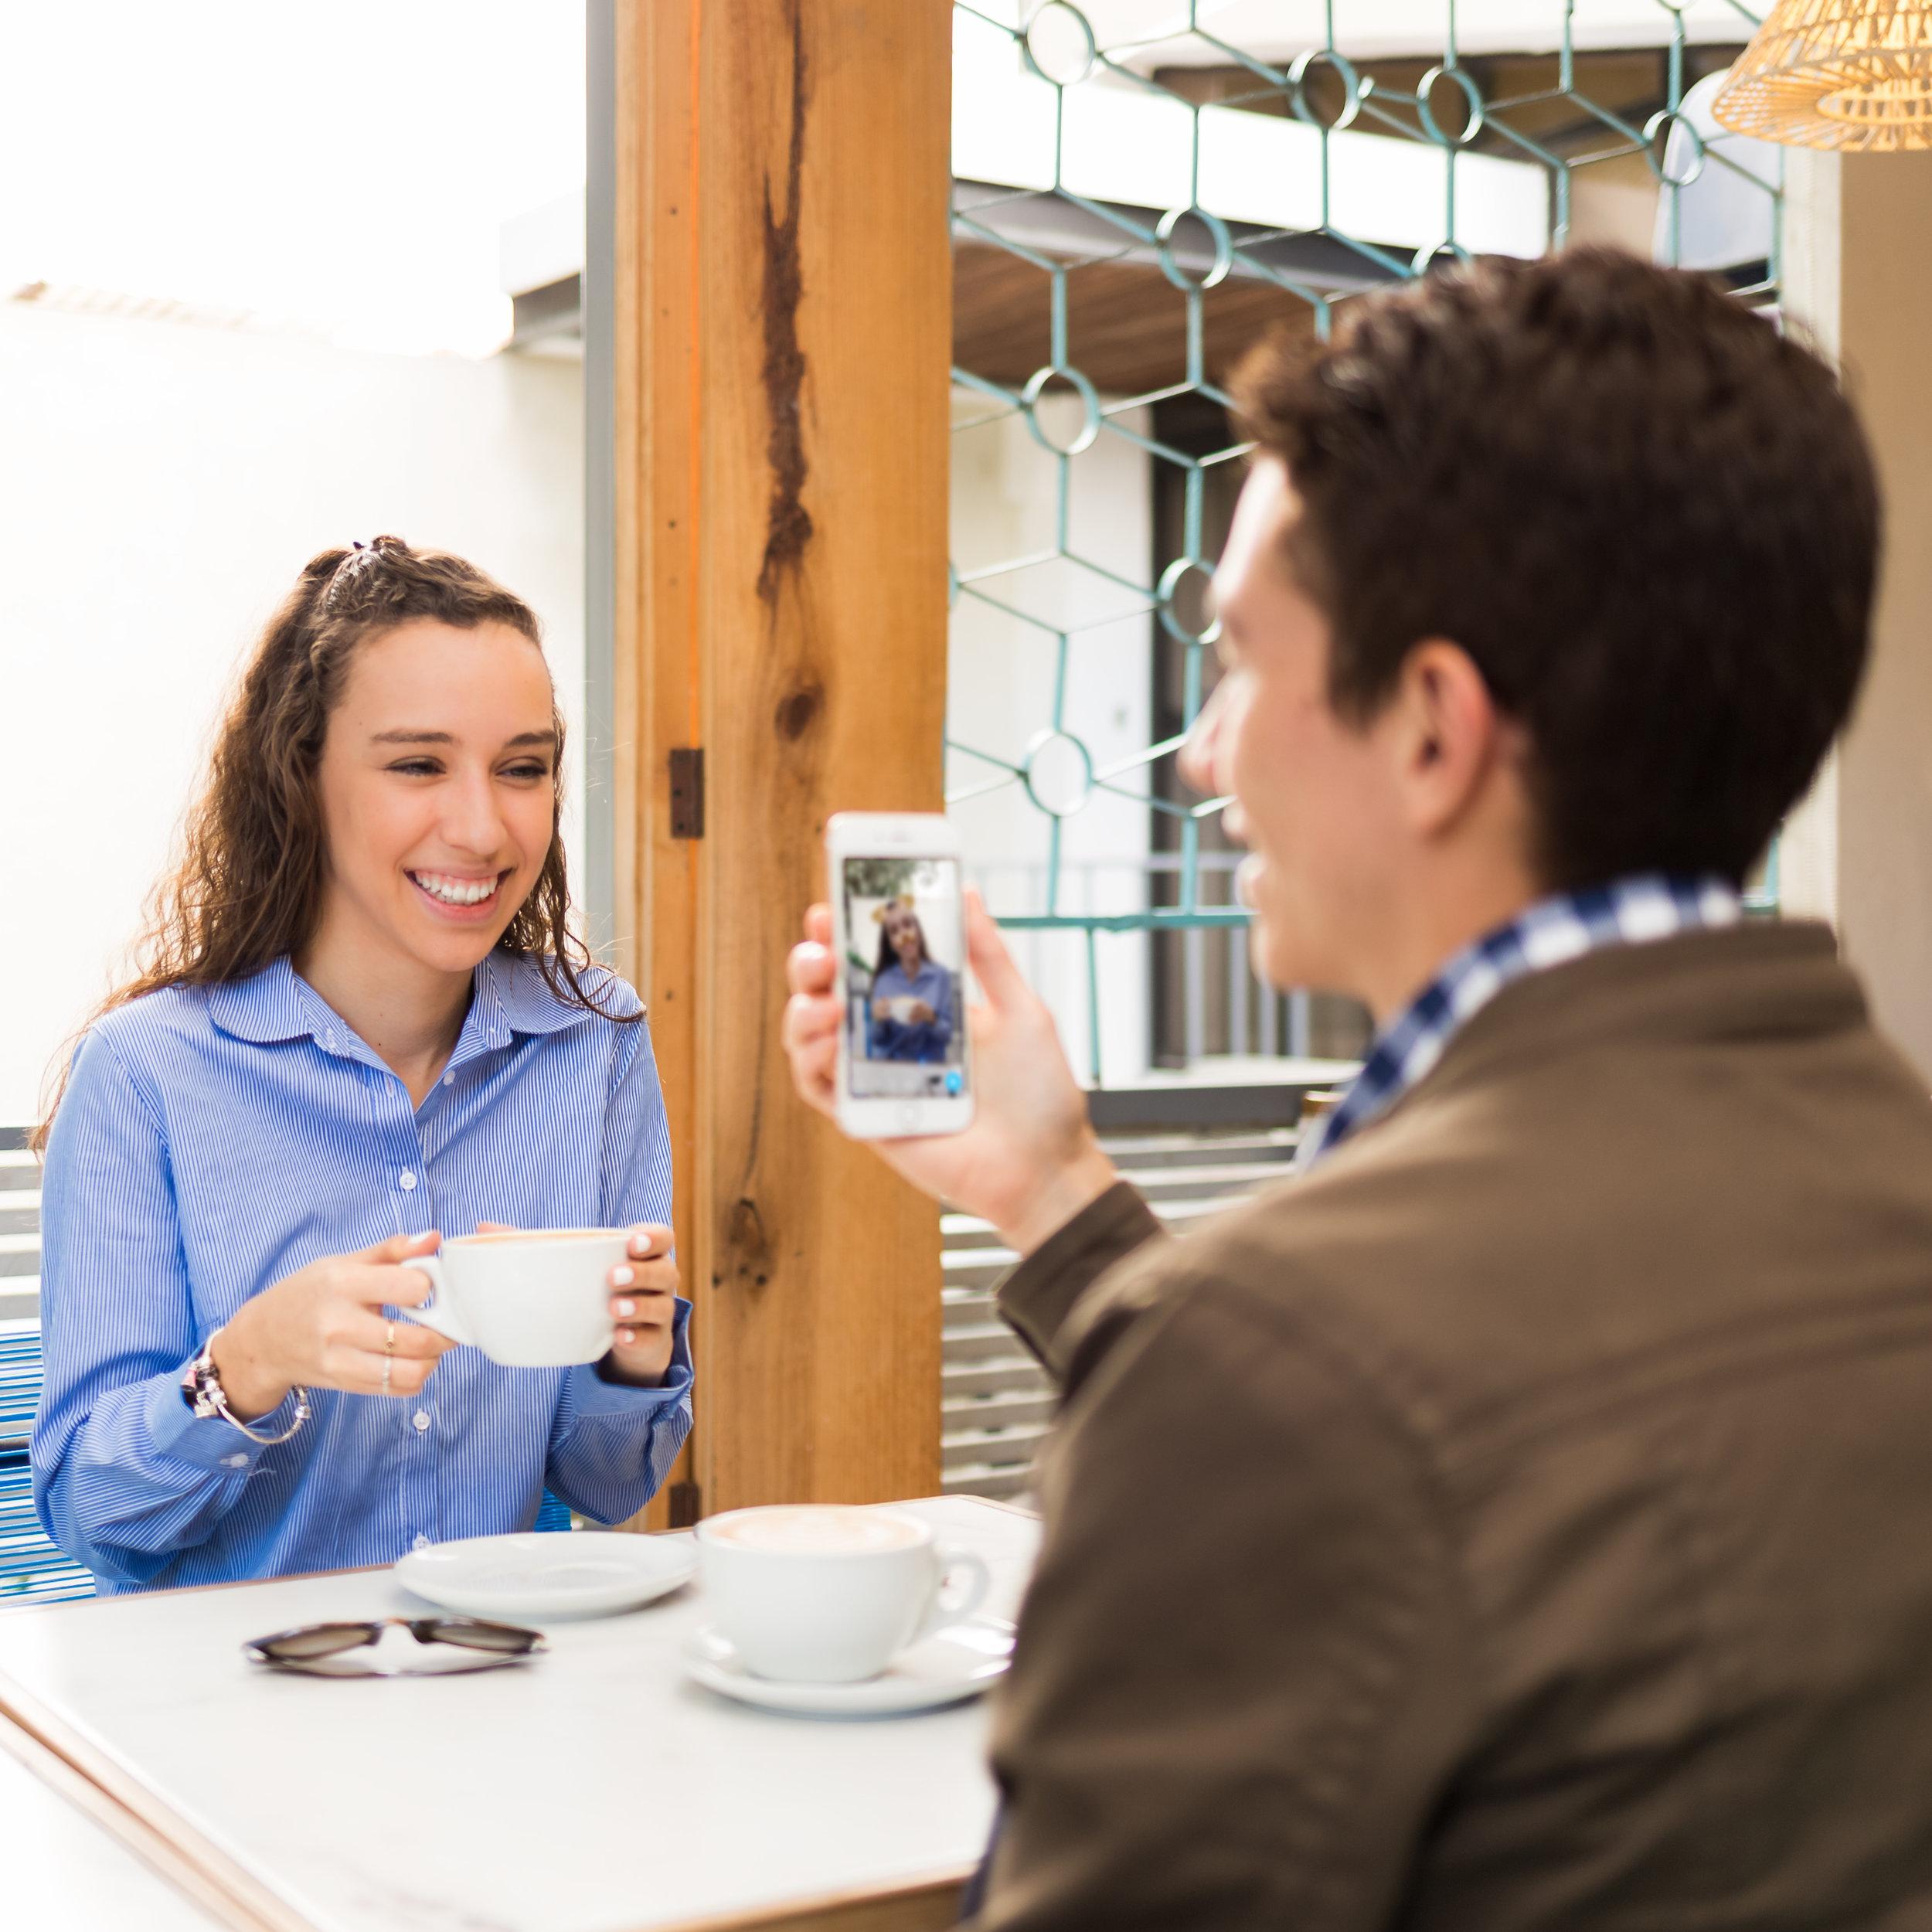 Coffee Date 1.jpg